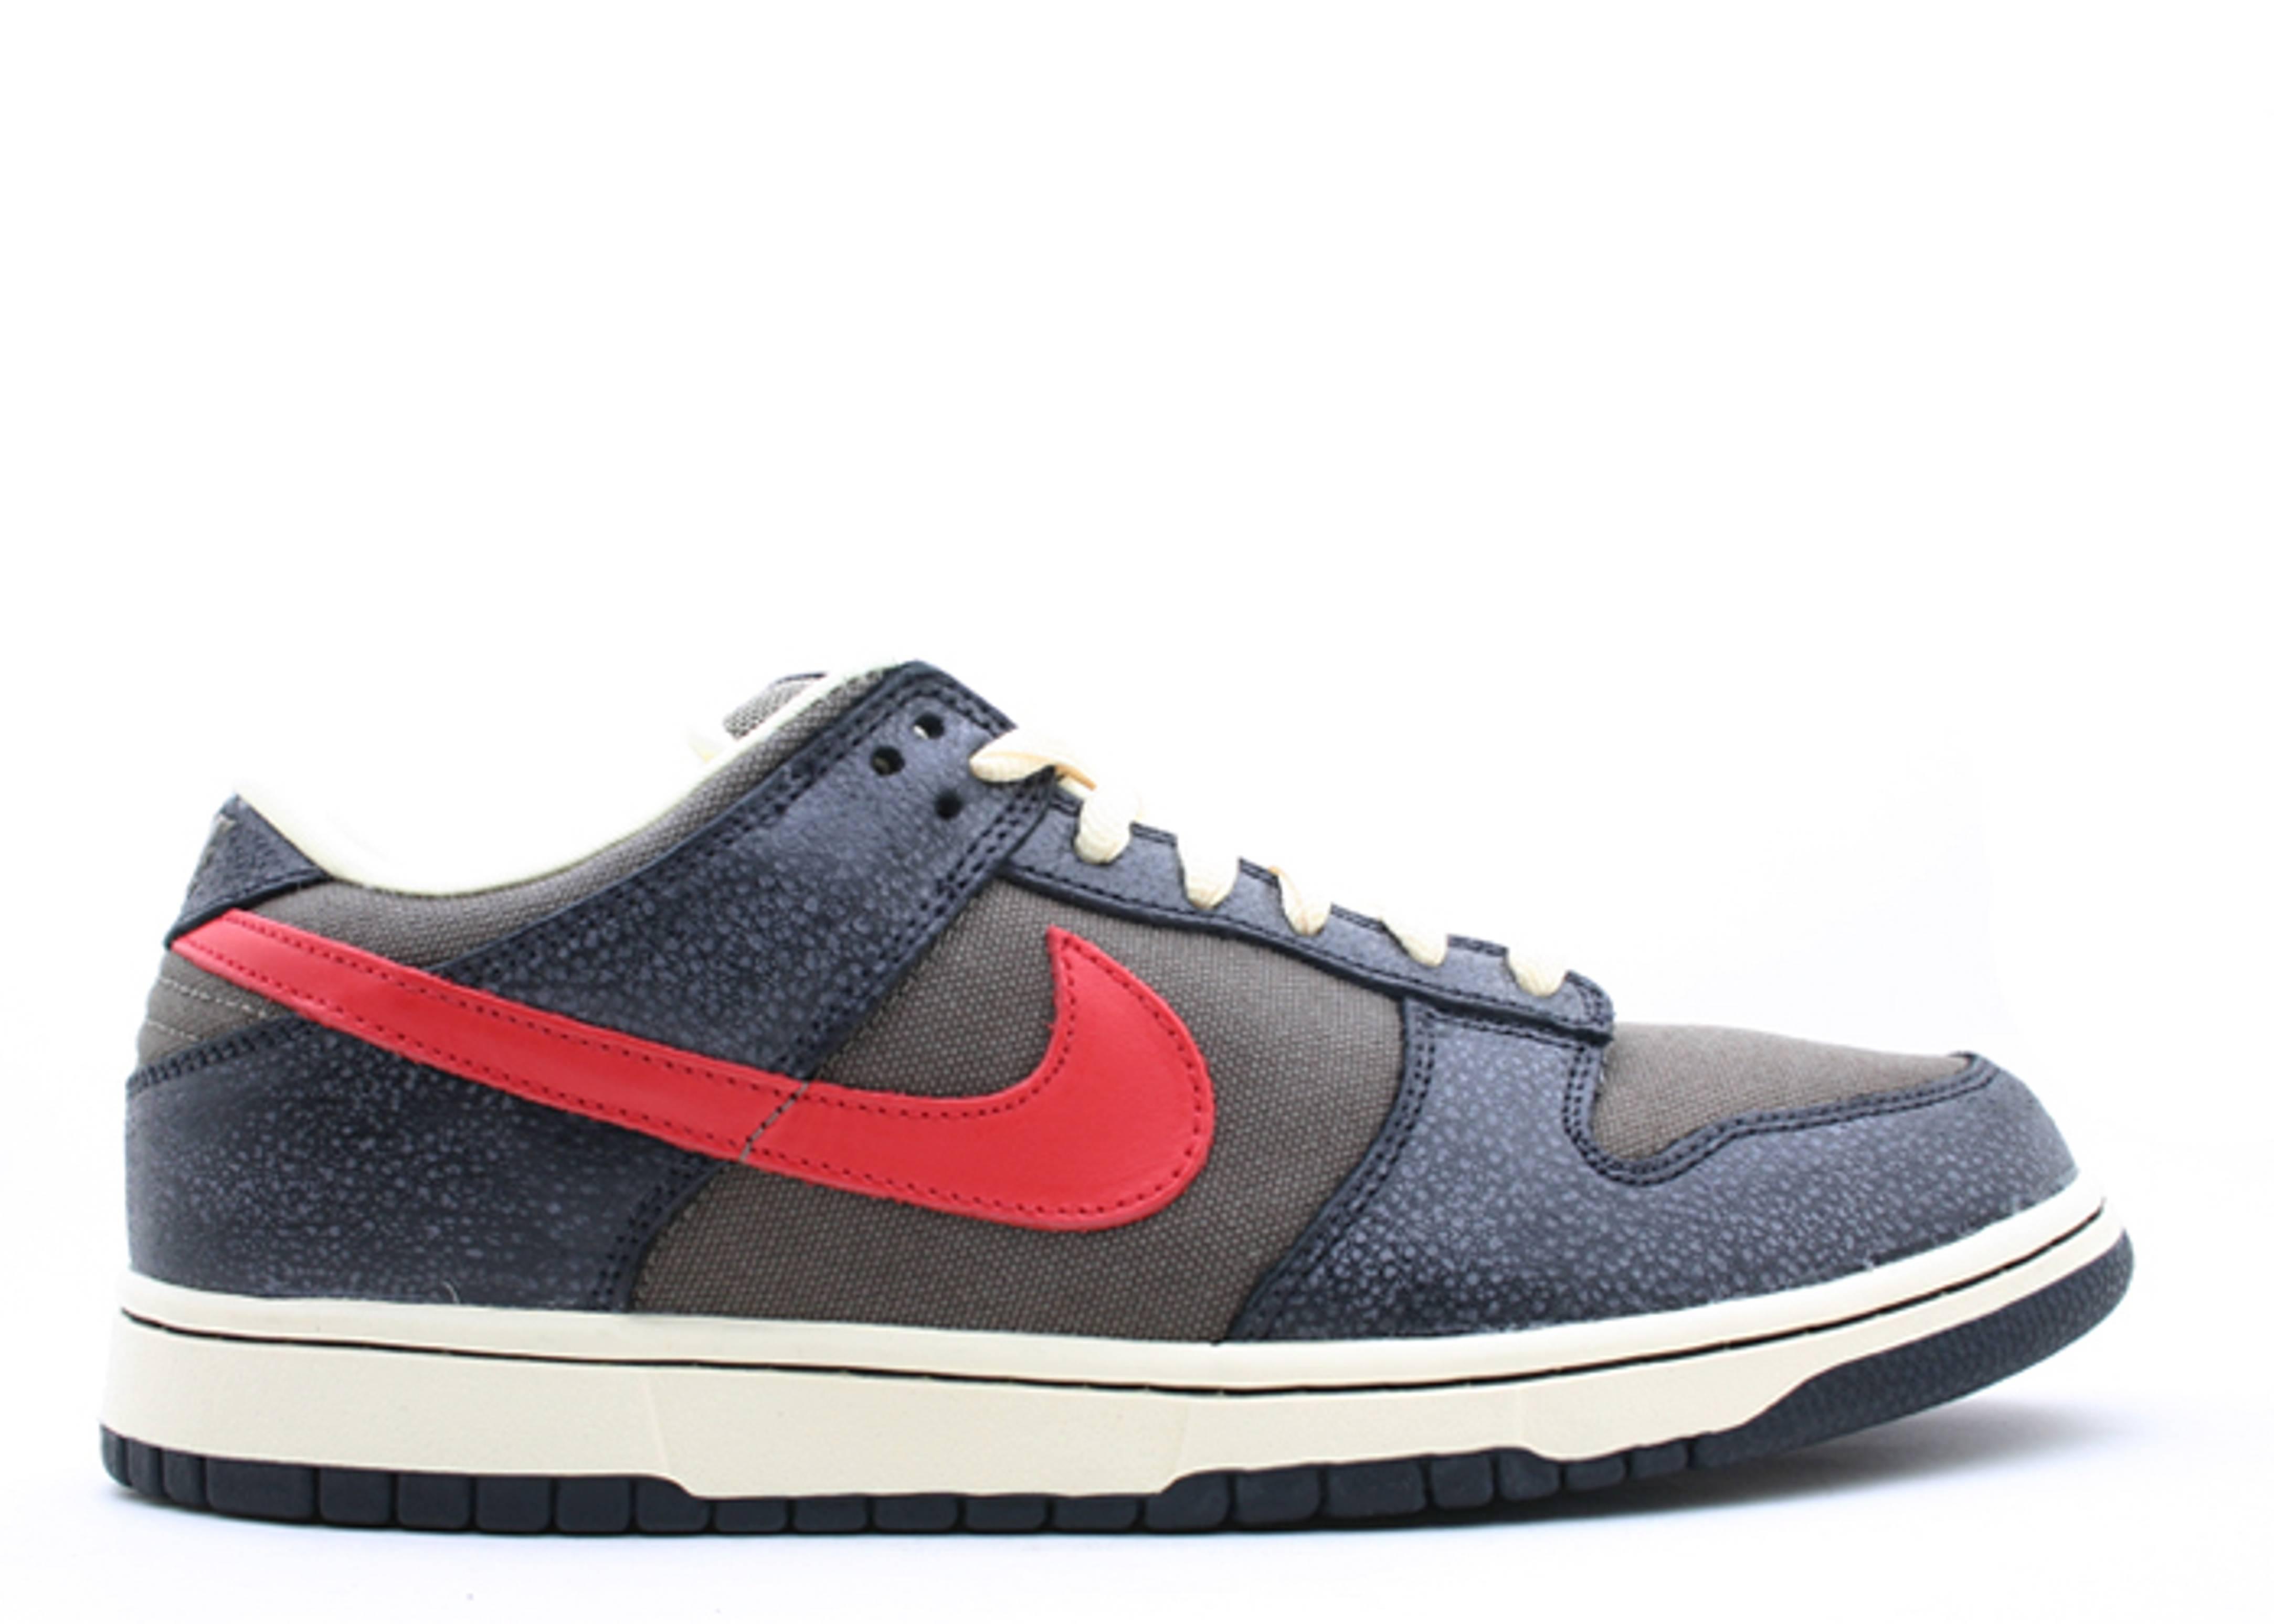 55f0c744b0e1 Dunk Low Premium Sb - Nike - 313170 061 - black atom red